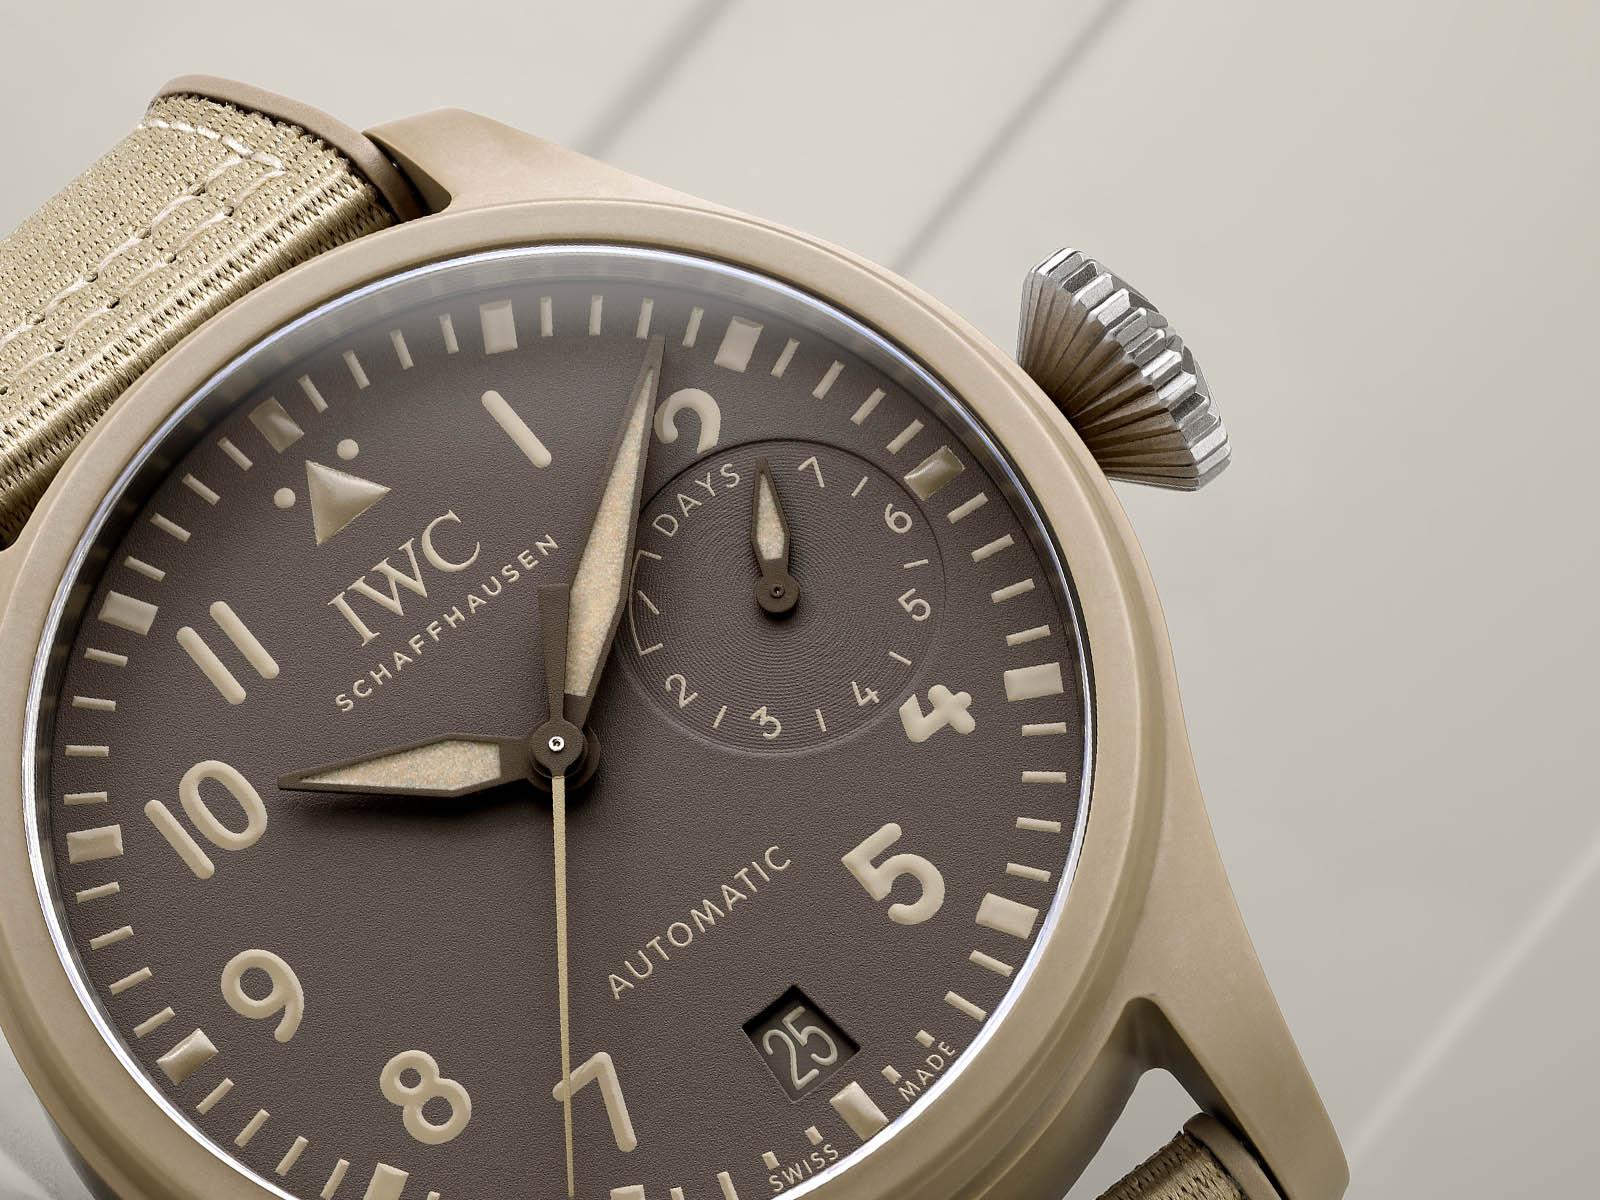 iw506003-iwc-big-pilot-s-watch-top-gun-edition-mojave-desert-3.jpg